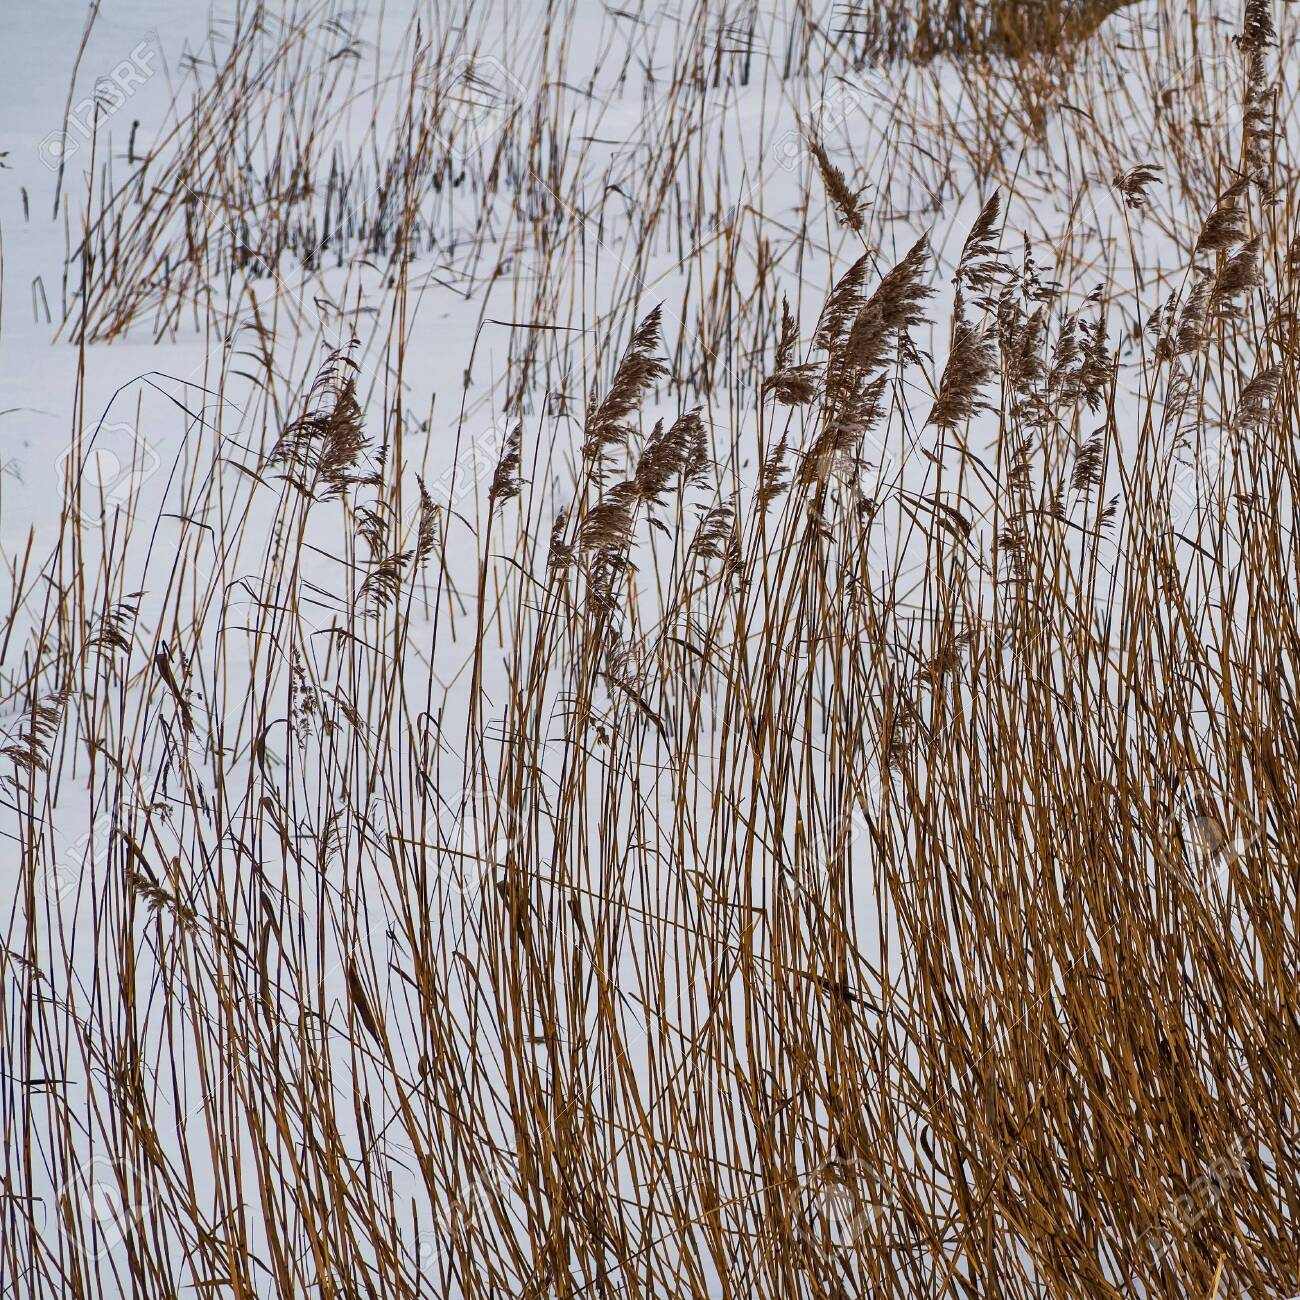 Coastal cane in the snow along the river Slavyanka. February. Pavlovsk. - 118778470